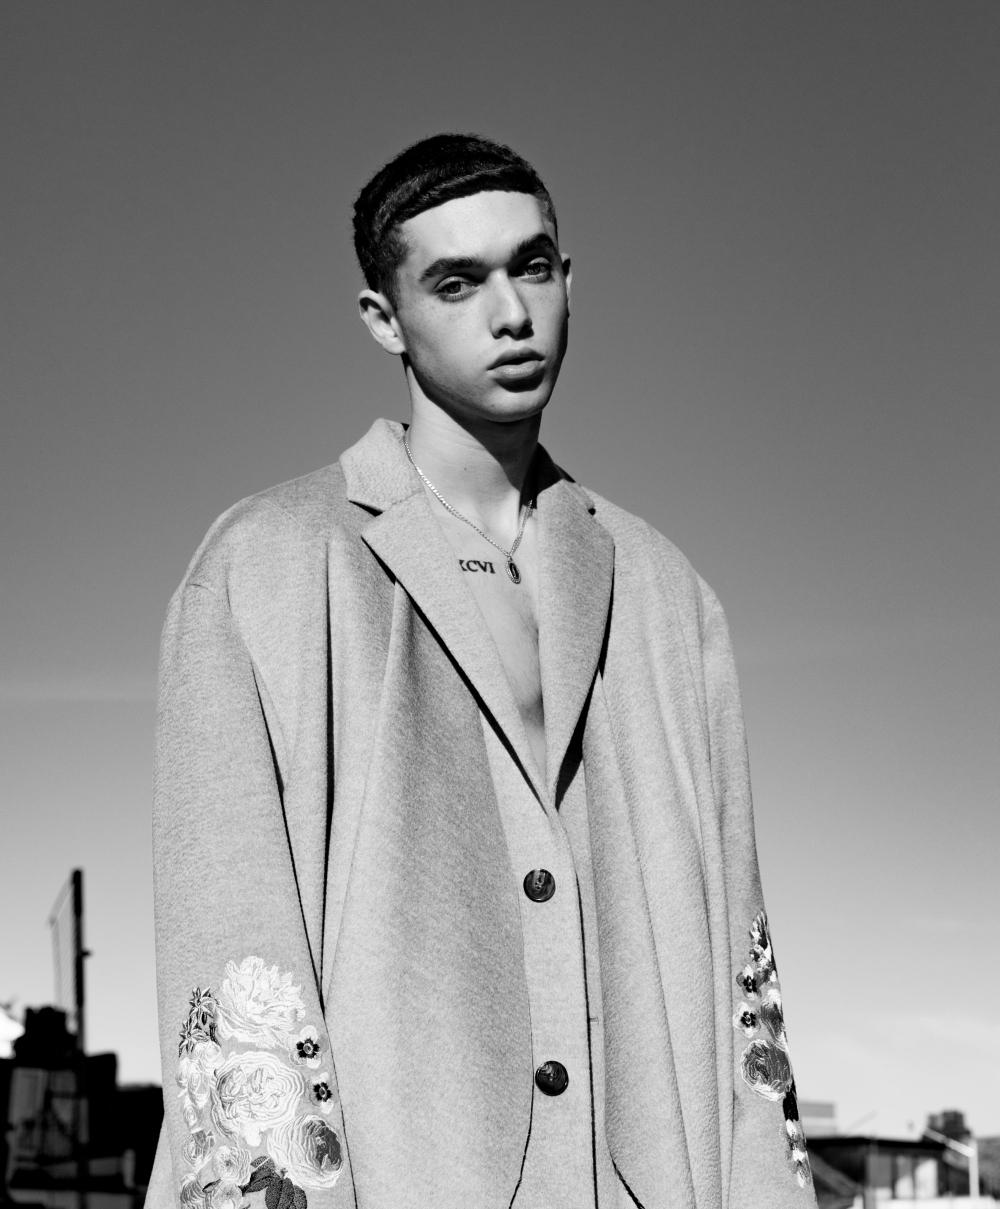 Joel Smedley Shoot (Vogue) 014